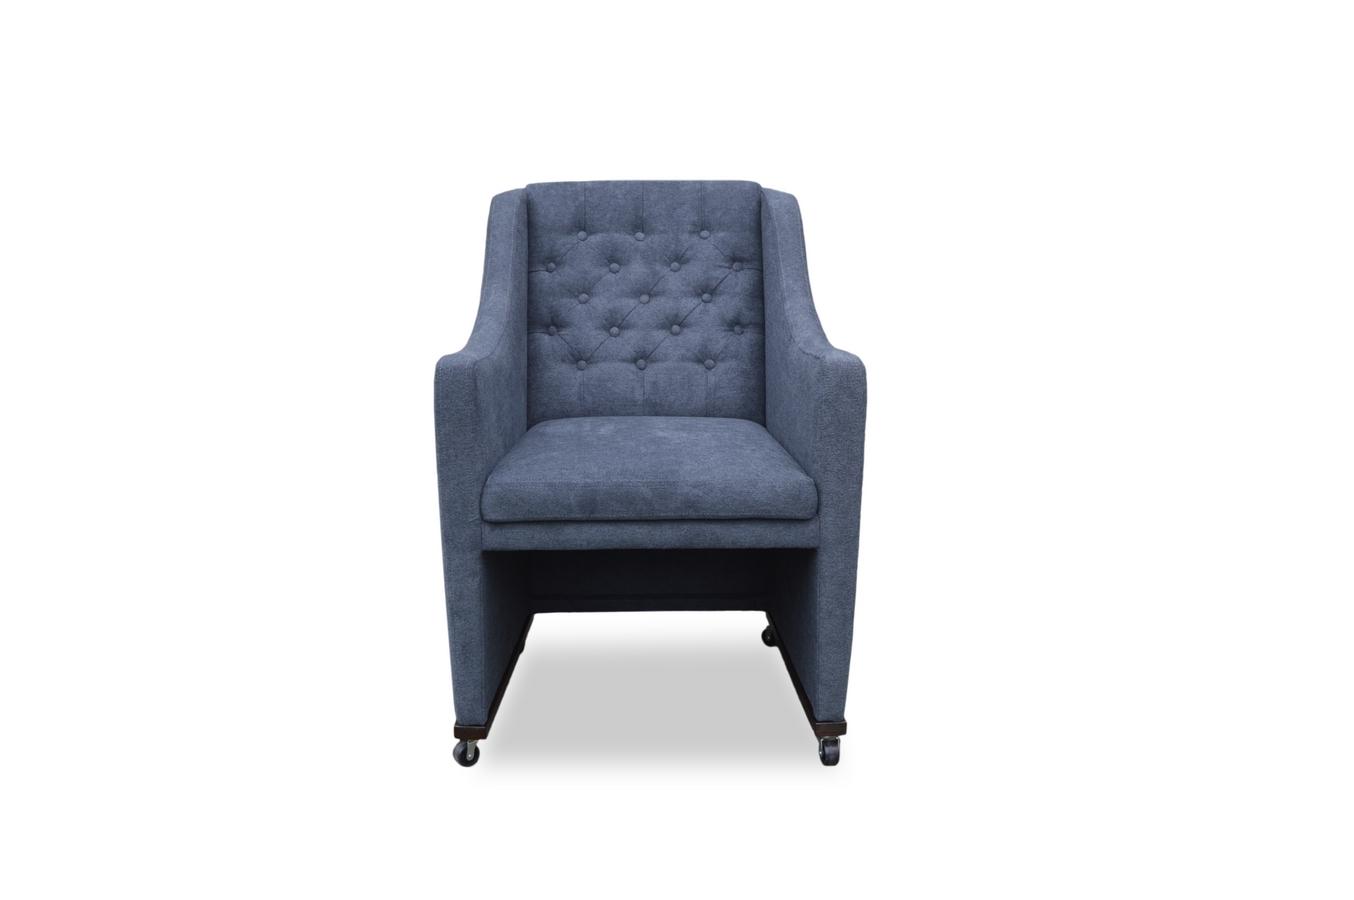 Wunderbar Chesterfield Esszimmerstühle Beste Wahl Stuhl Sessel Rollen Konferenz Wartezimmer Büro Lounge